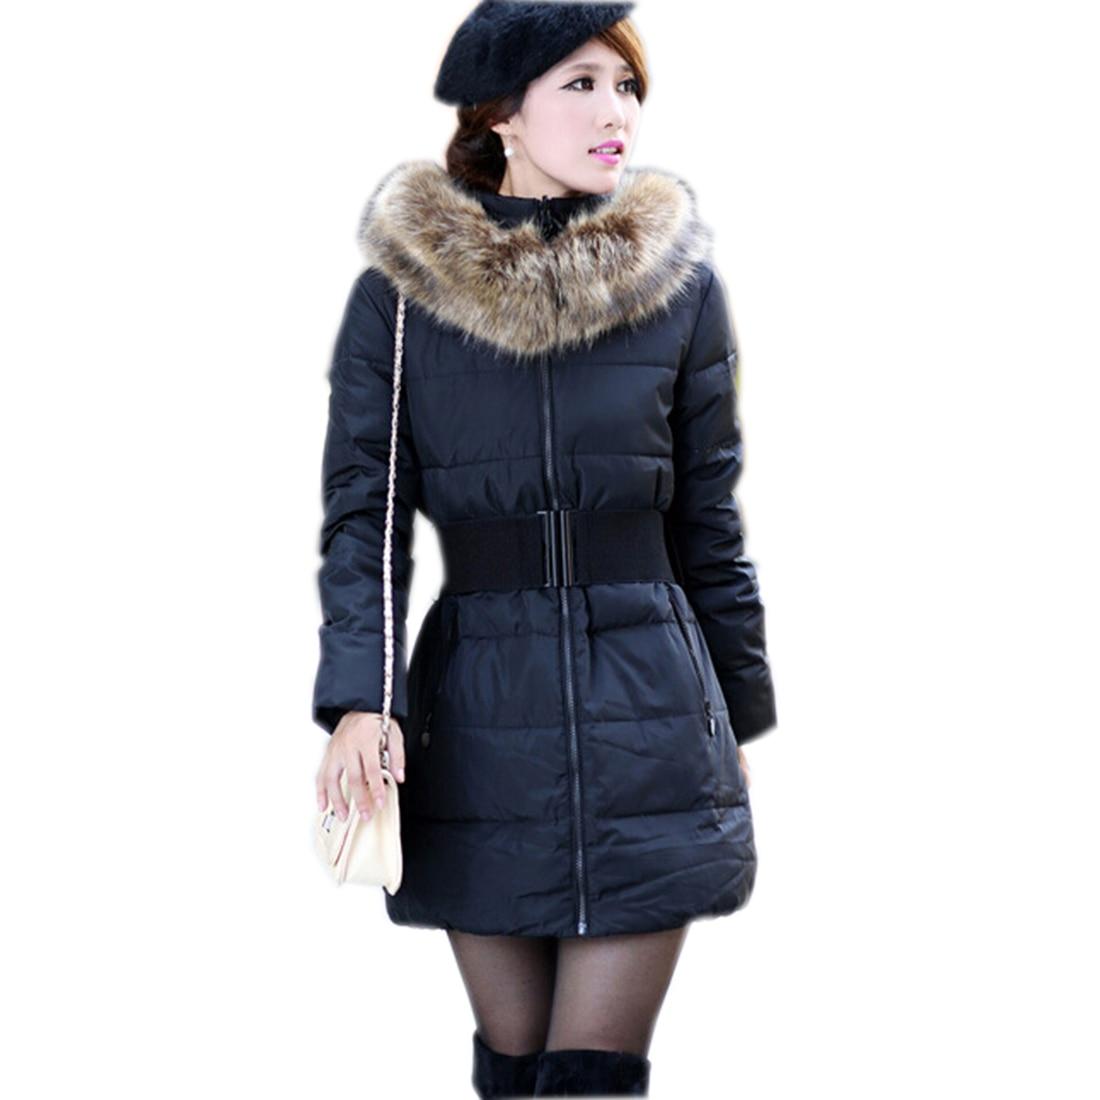 Fashion 2017 Autumn Winter Women Long Parka Female Warm Jacket Coat Slim Hooded Fur Collar Outwear Overcoats With Belt Îäåæäà è àêñåññóàðû<br><br>